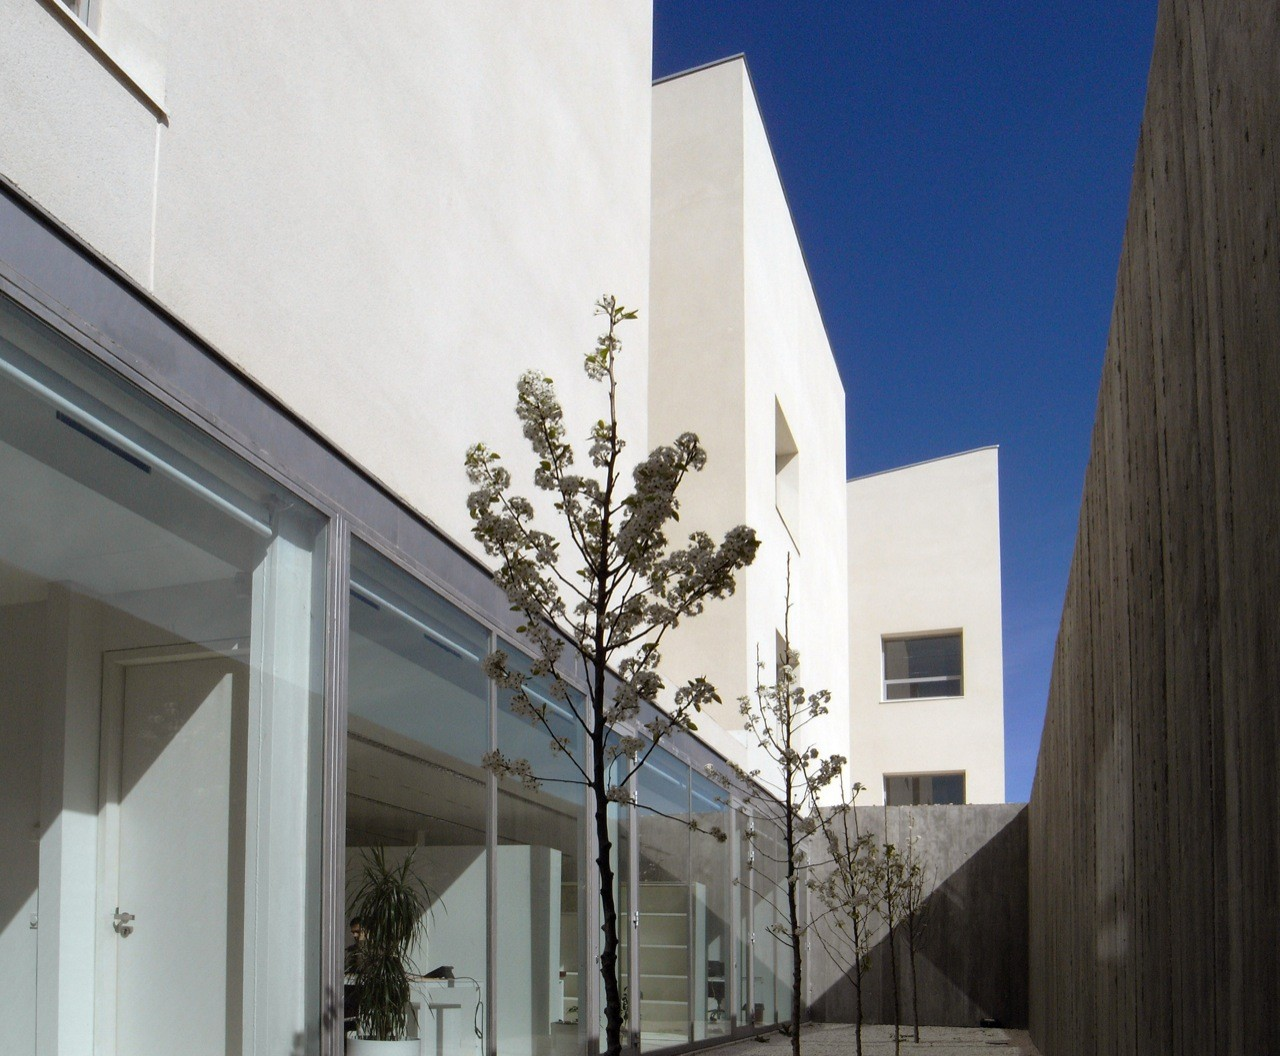 © Xabier Ilundain Madurga, Taller Básico de Arquitectura